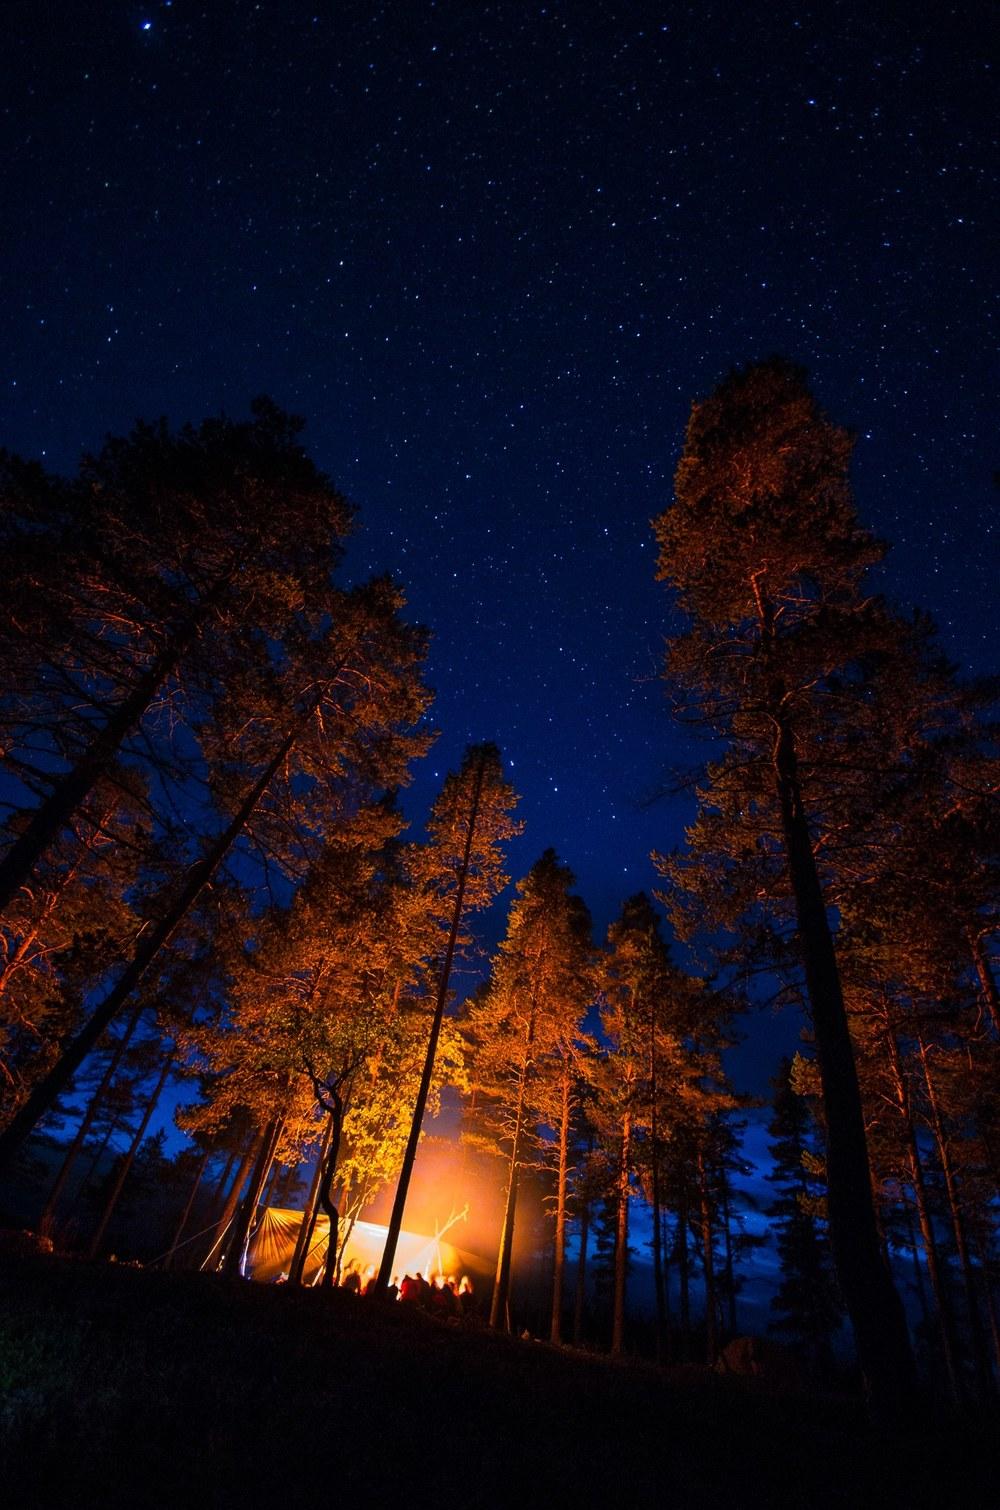 Bålkos under gapahuken med stjernehimmel